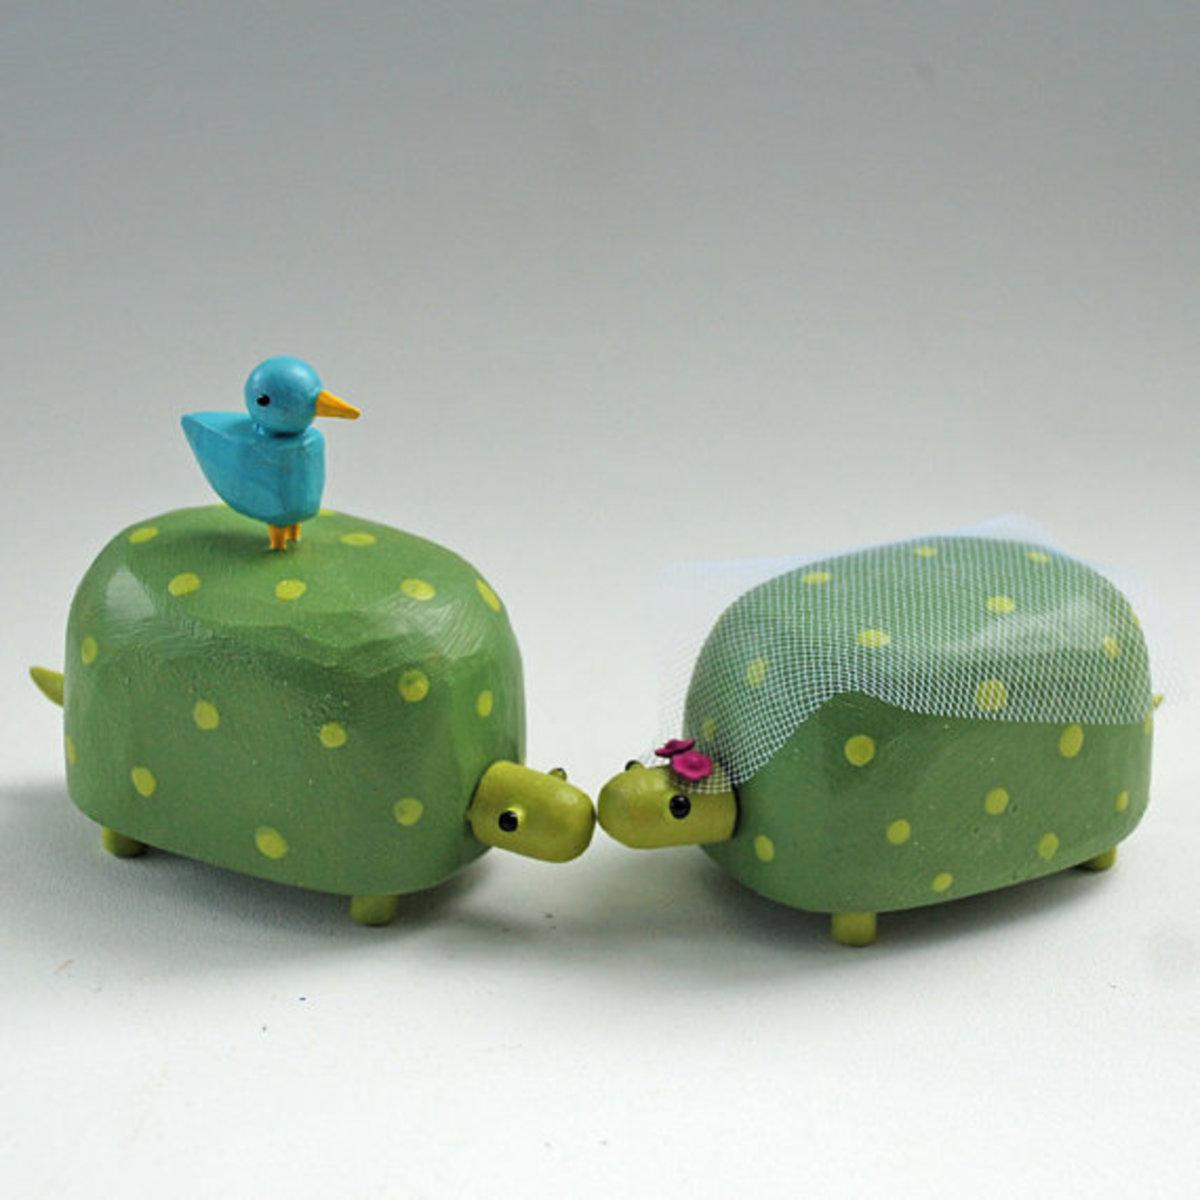 Little wooden turtles!